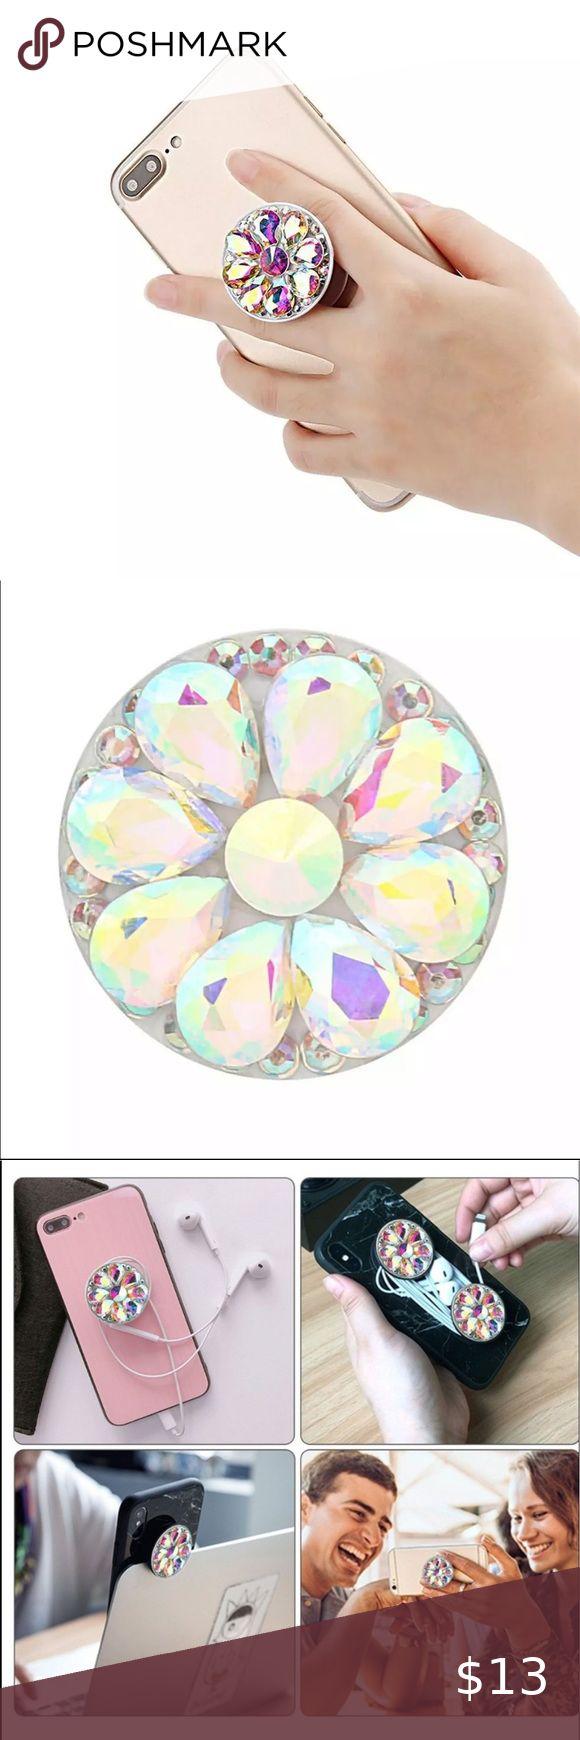 Jeweled Pop Socket NWT in 2020 | Jewel pops. Boutique accessories. Jewels